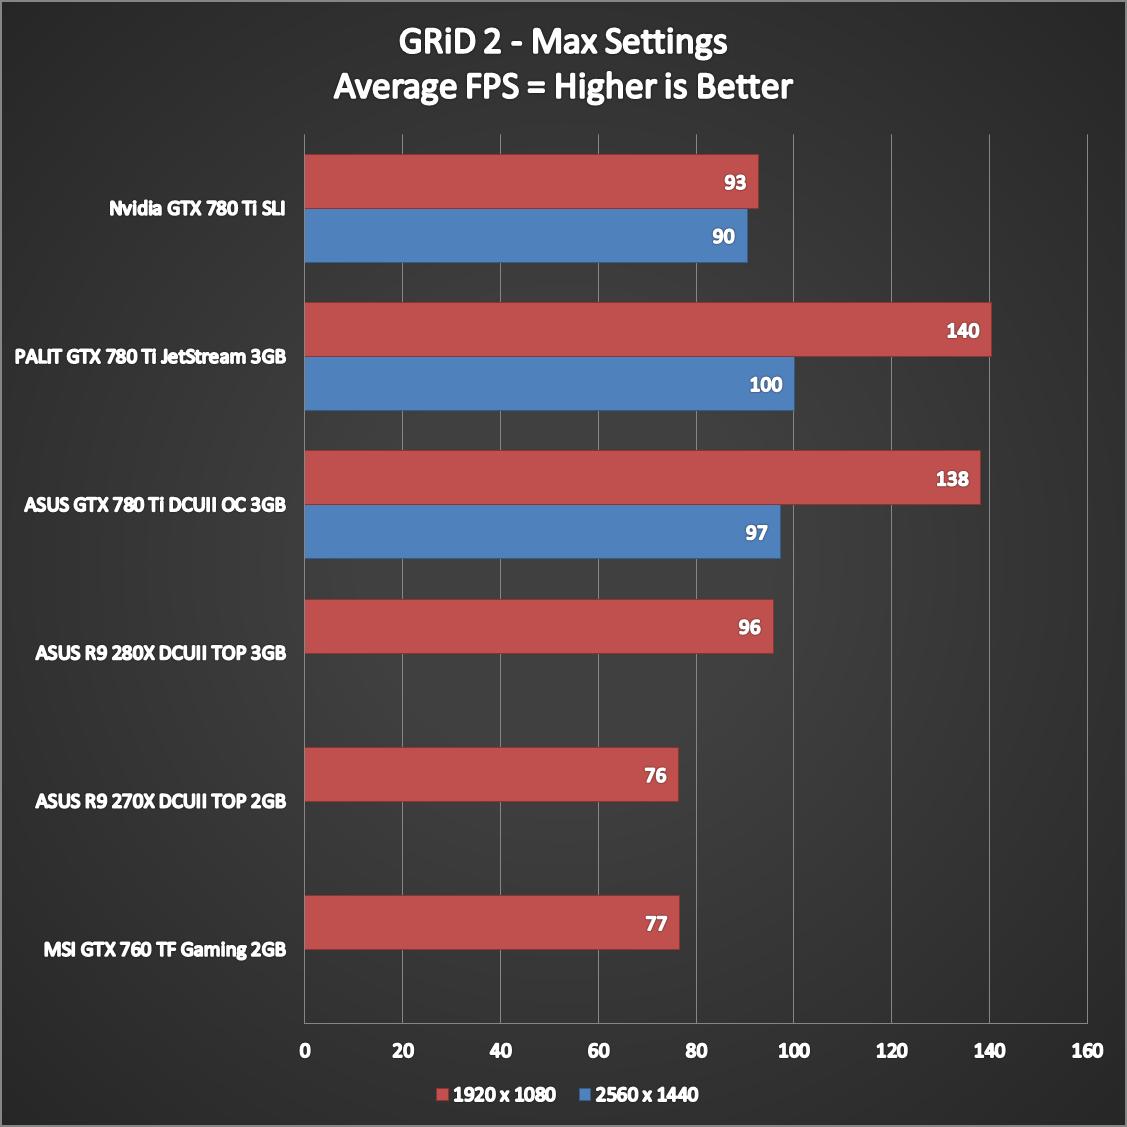 ASUS-Palit-GTX-780-Ti-Performance-9